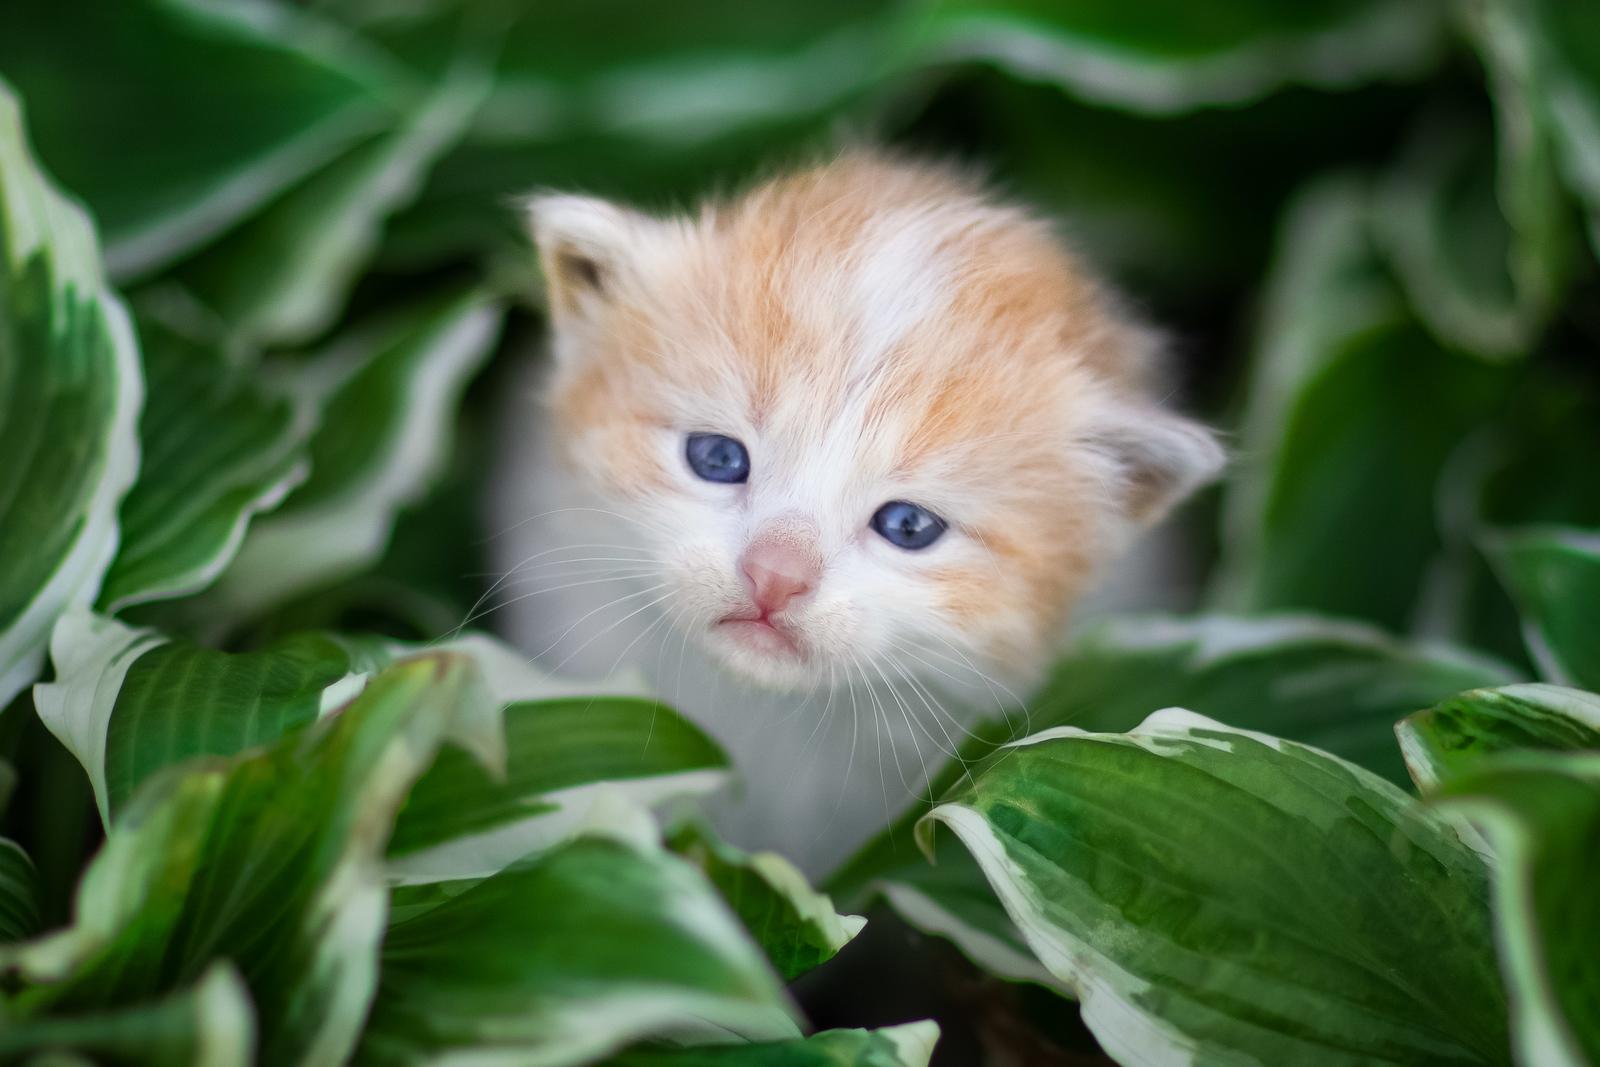 Kitten surrounds by green